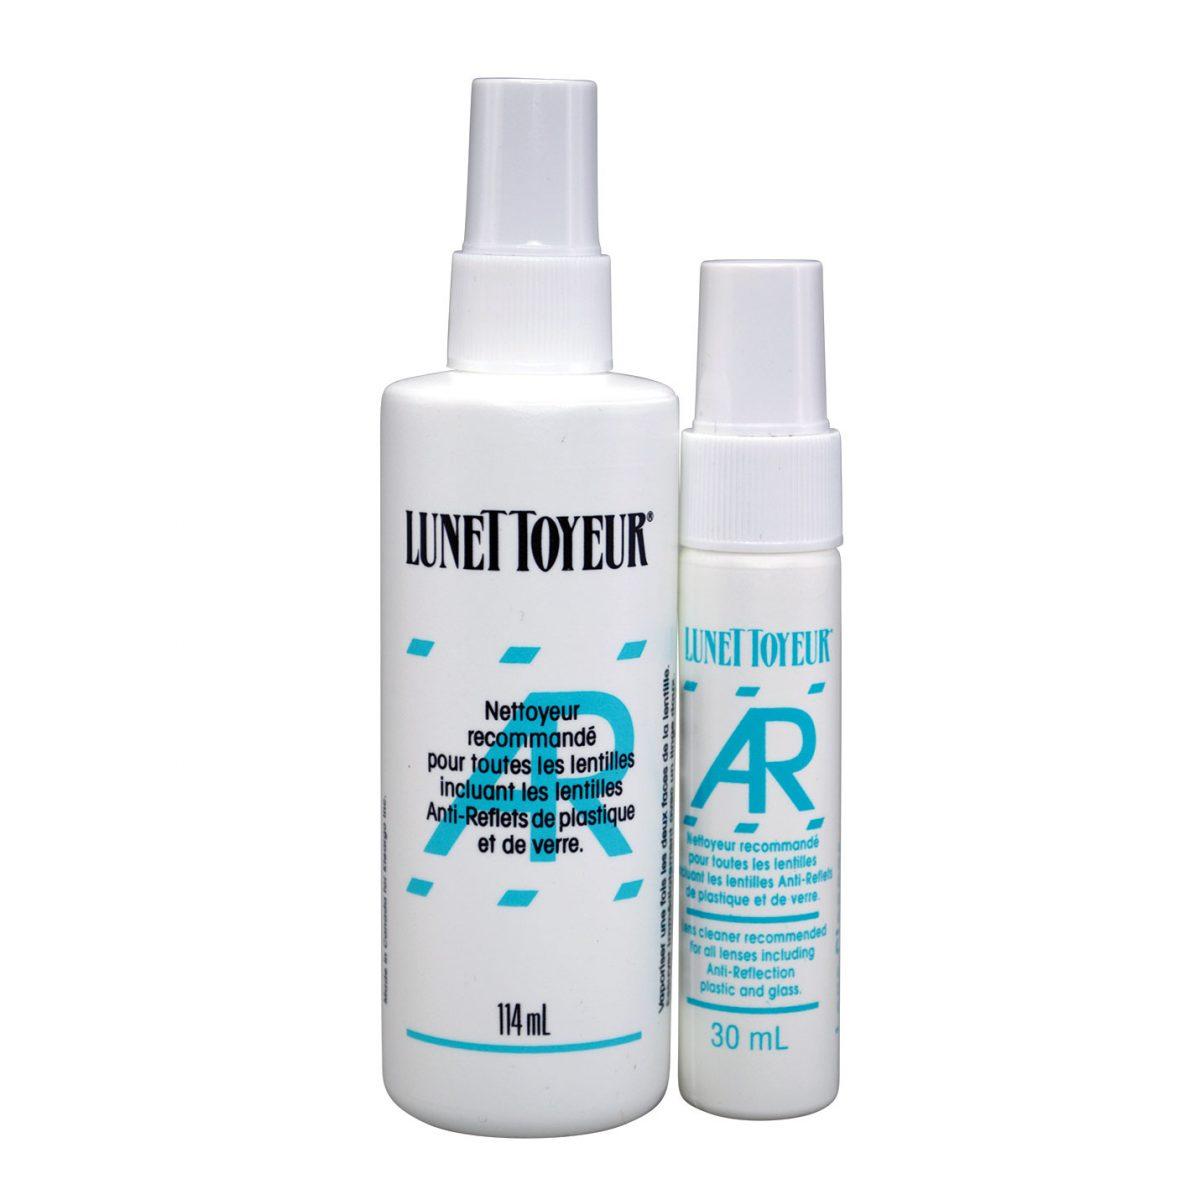 Lunettoyeur Anti reflection lens cleaner